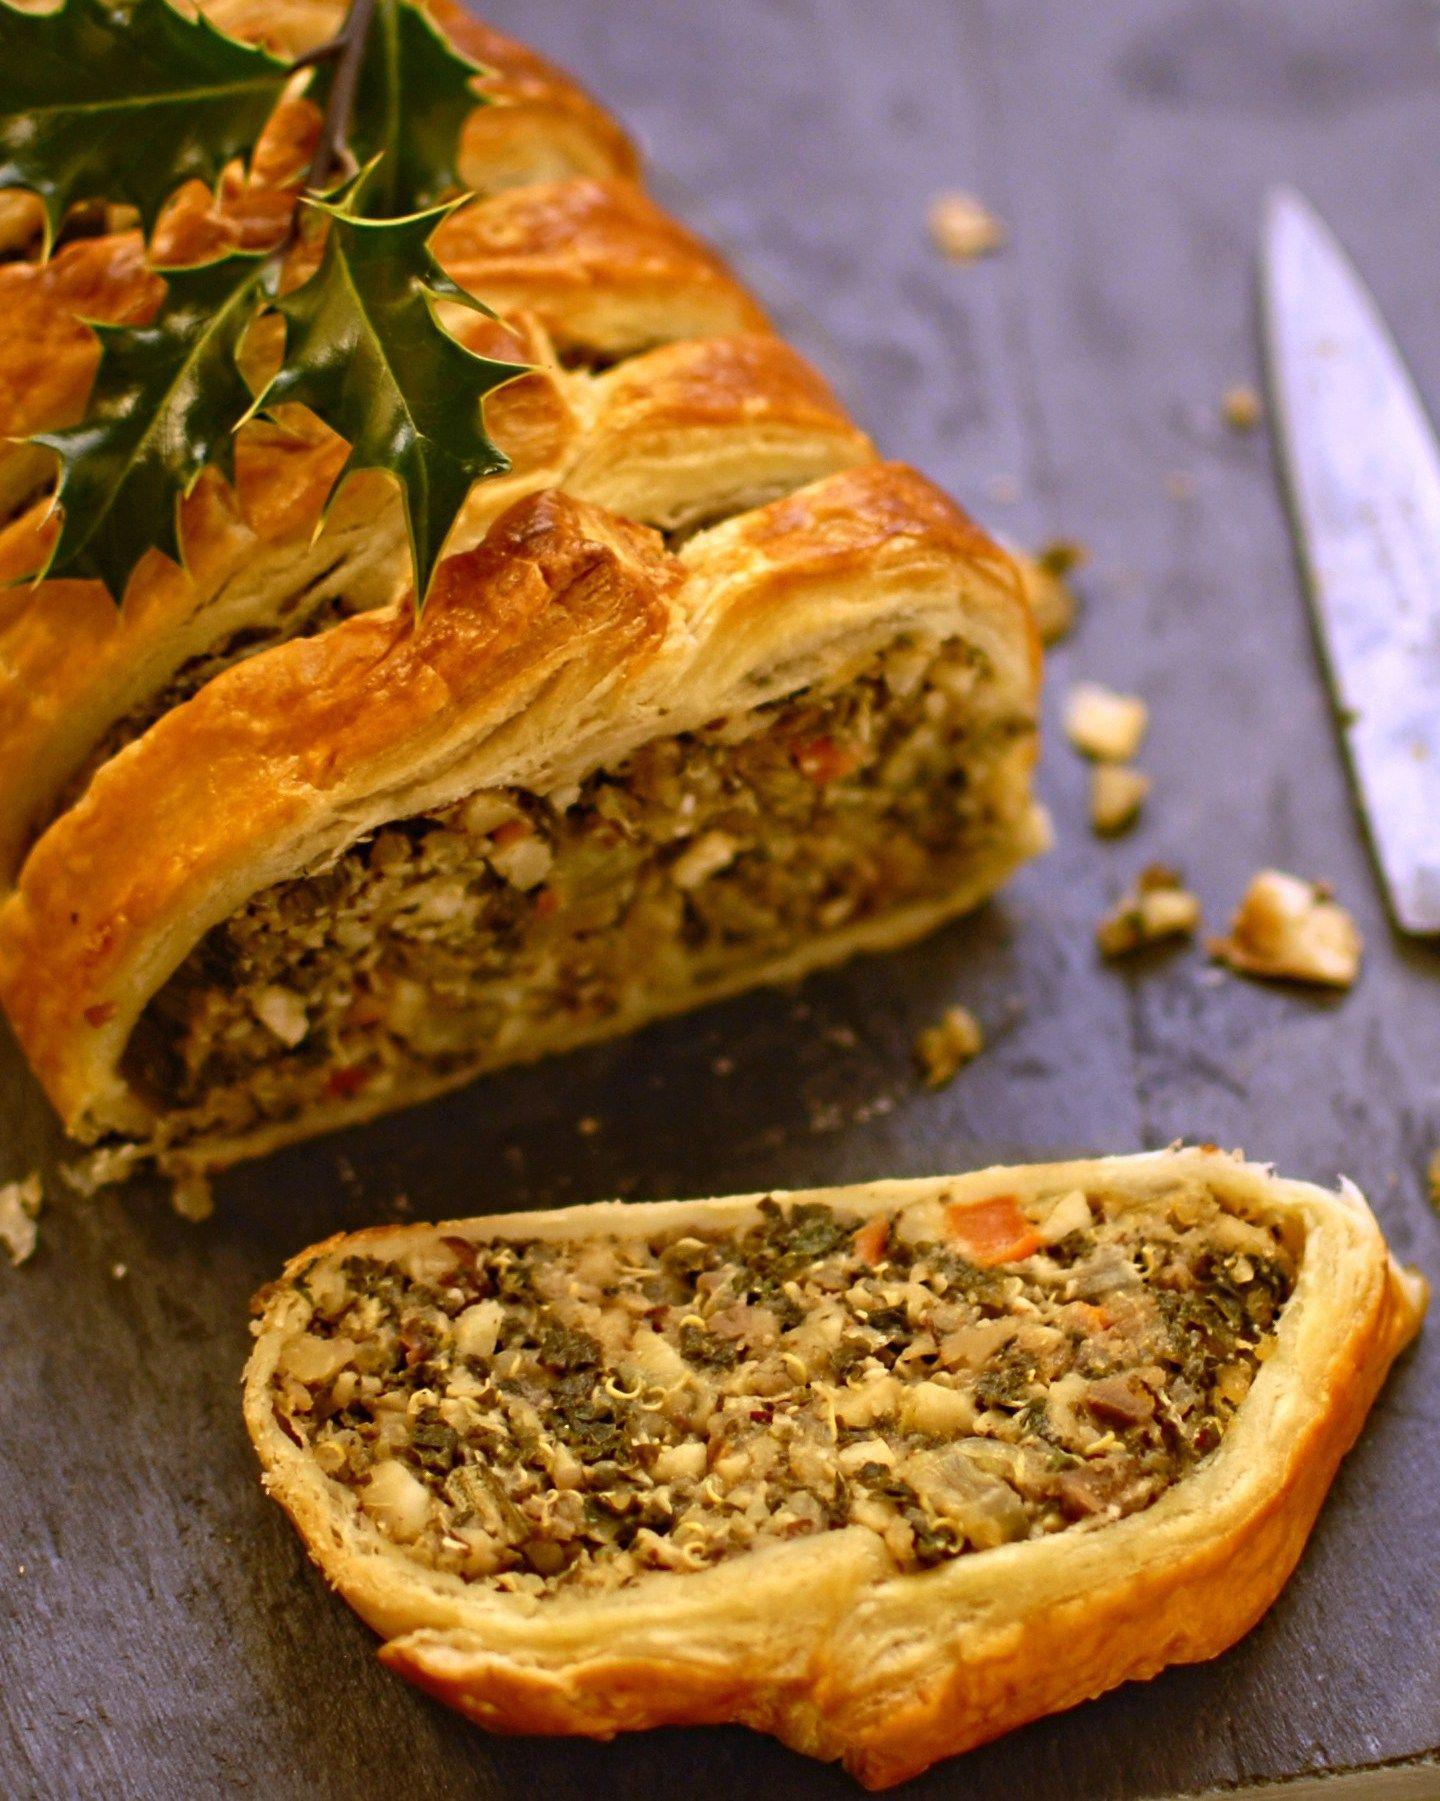 kale, quinoa and nut roast en croute Vegan christmas